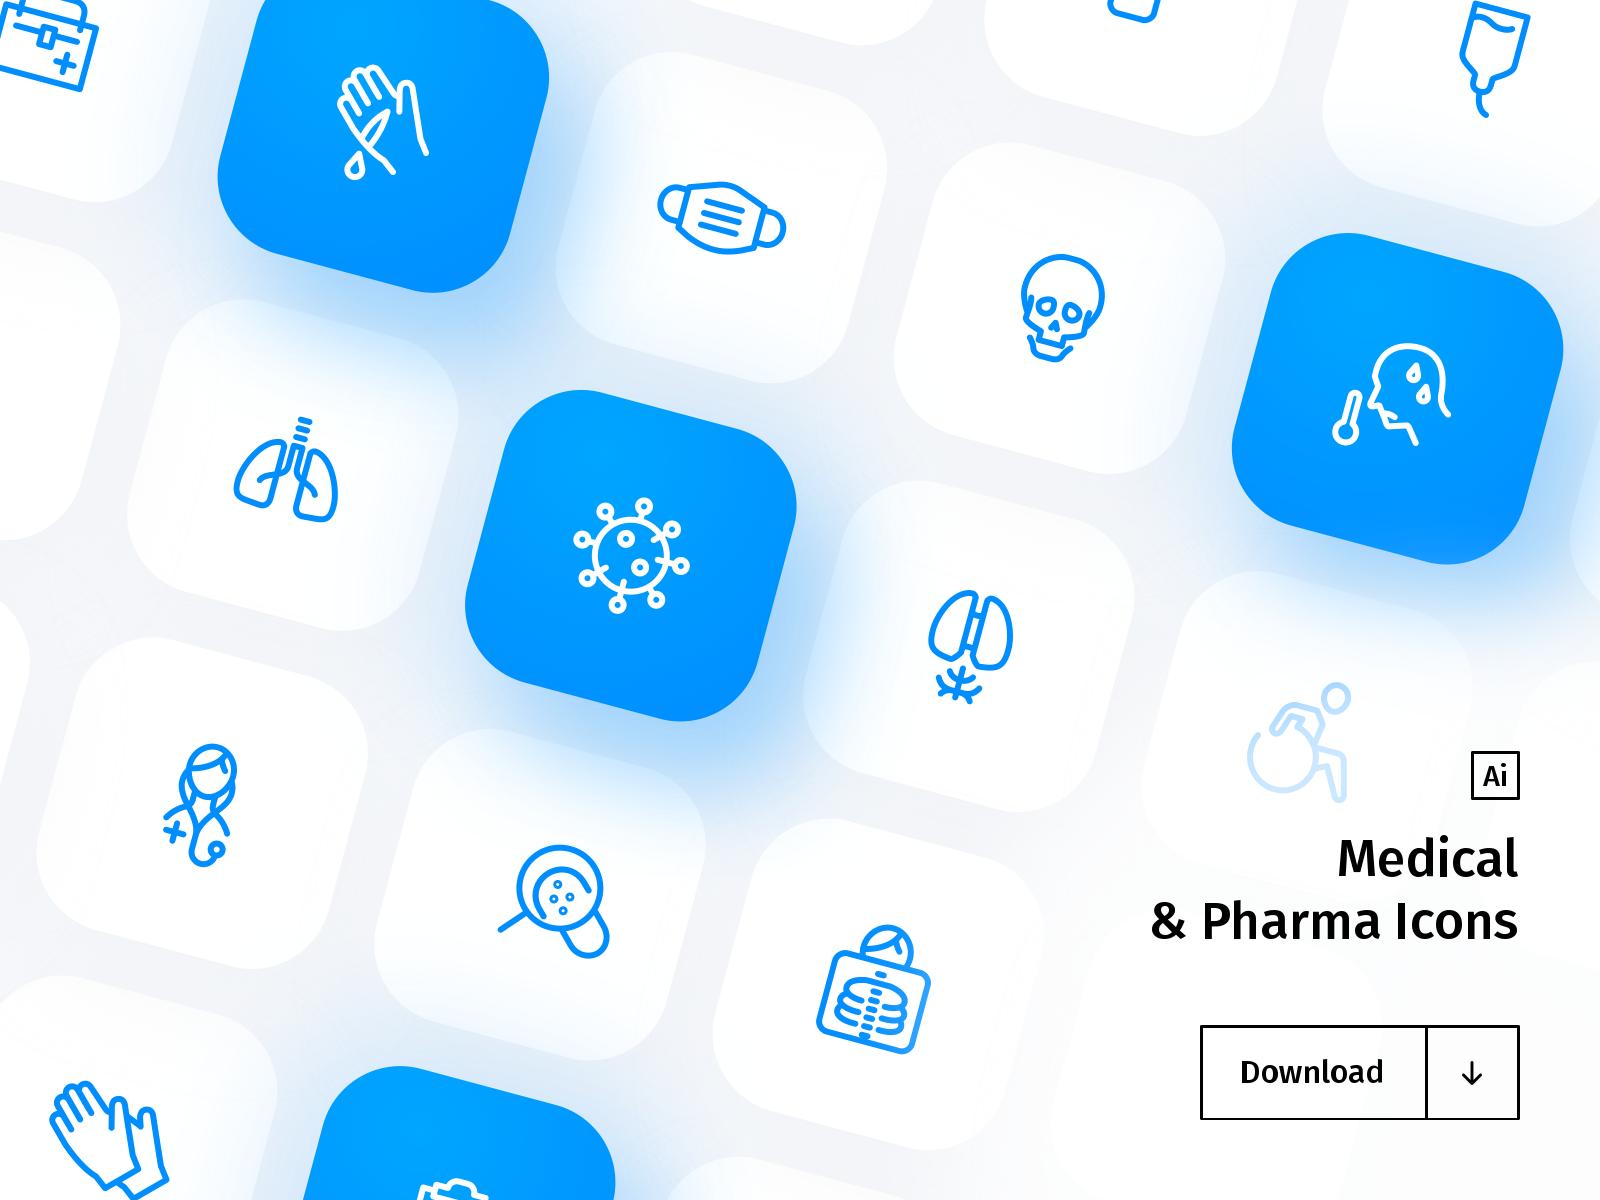 Medical & Pharma Icon Set - Freebie